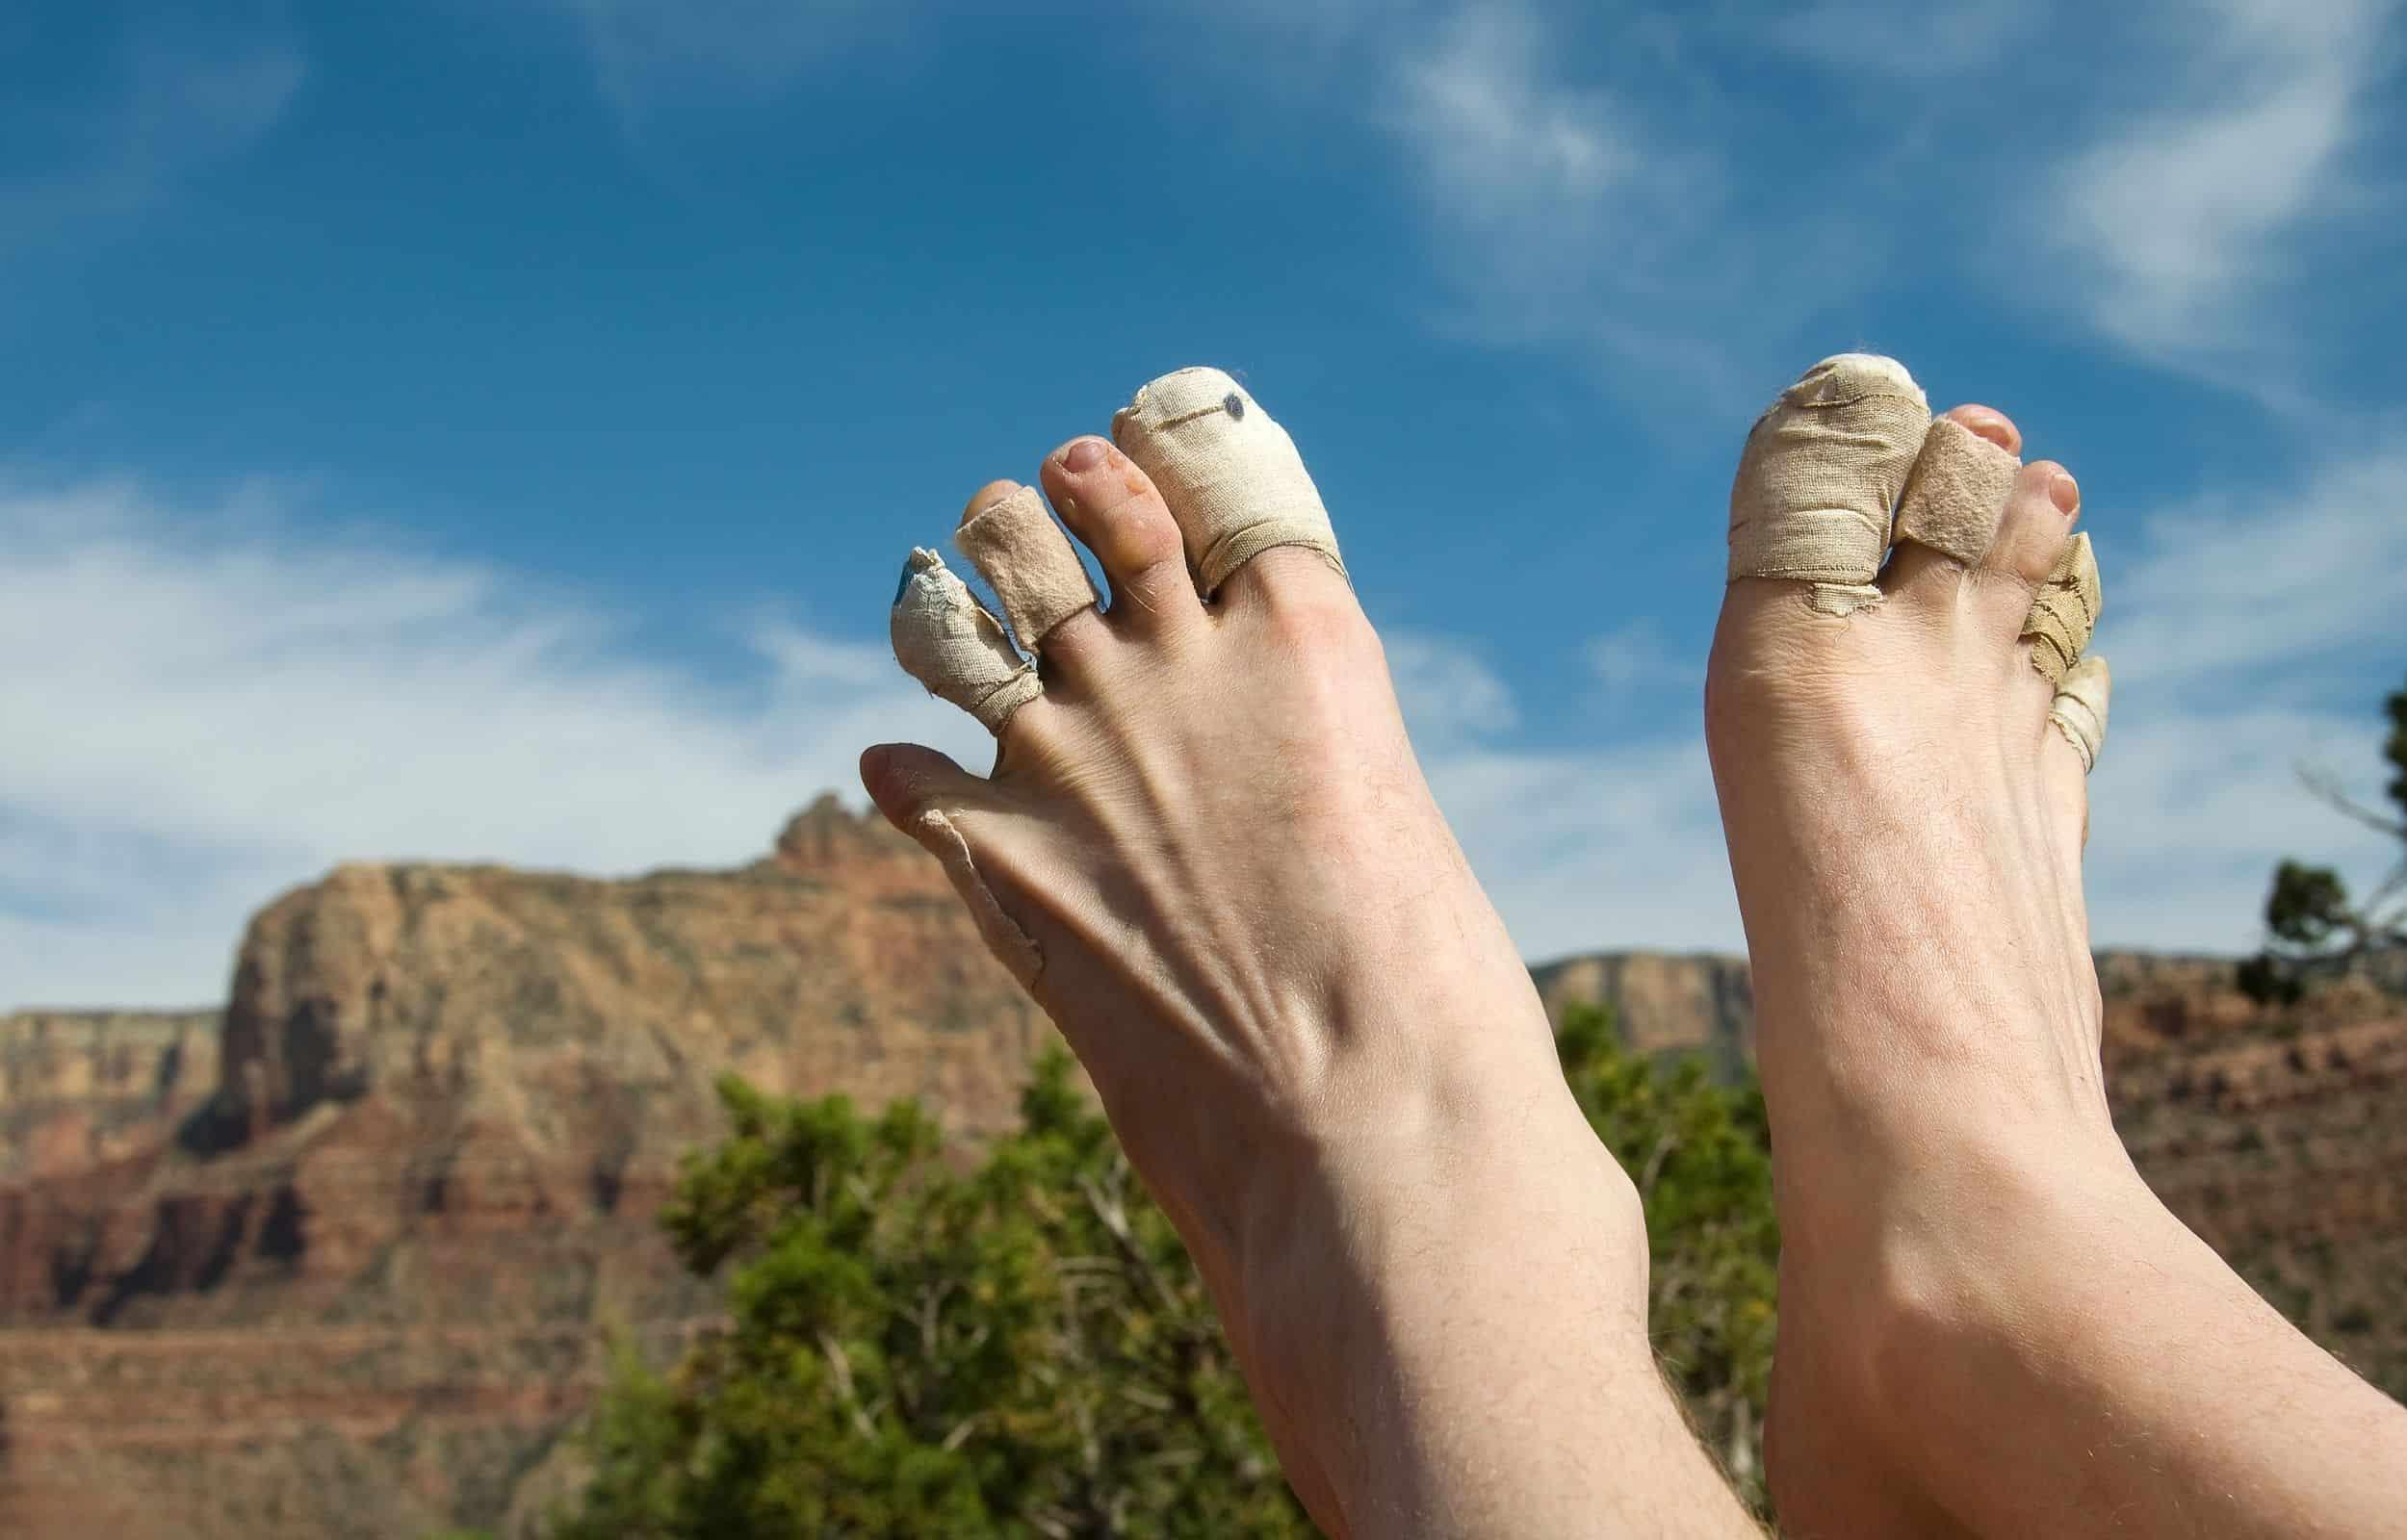 hiking blisters bandaids